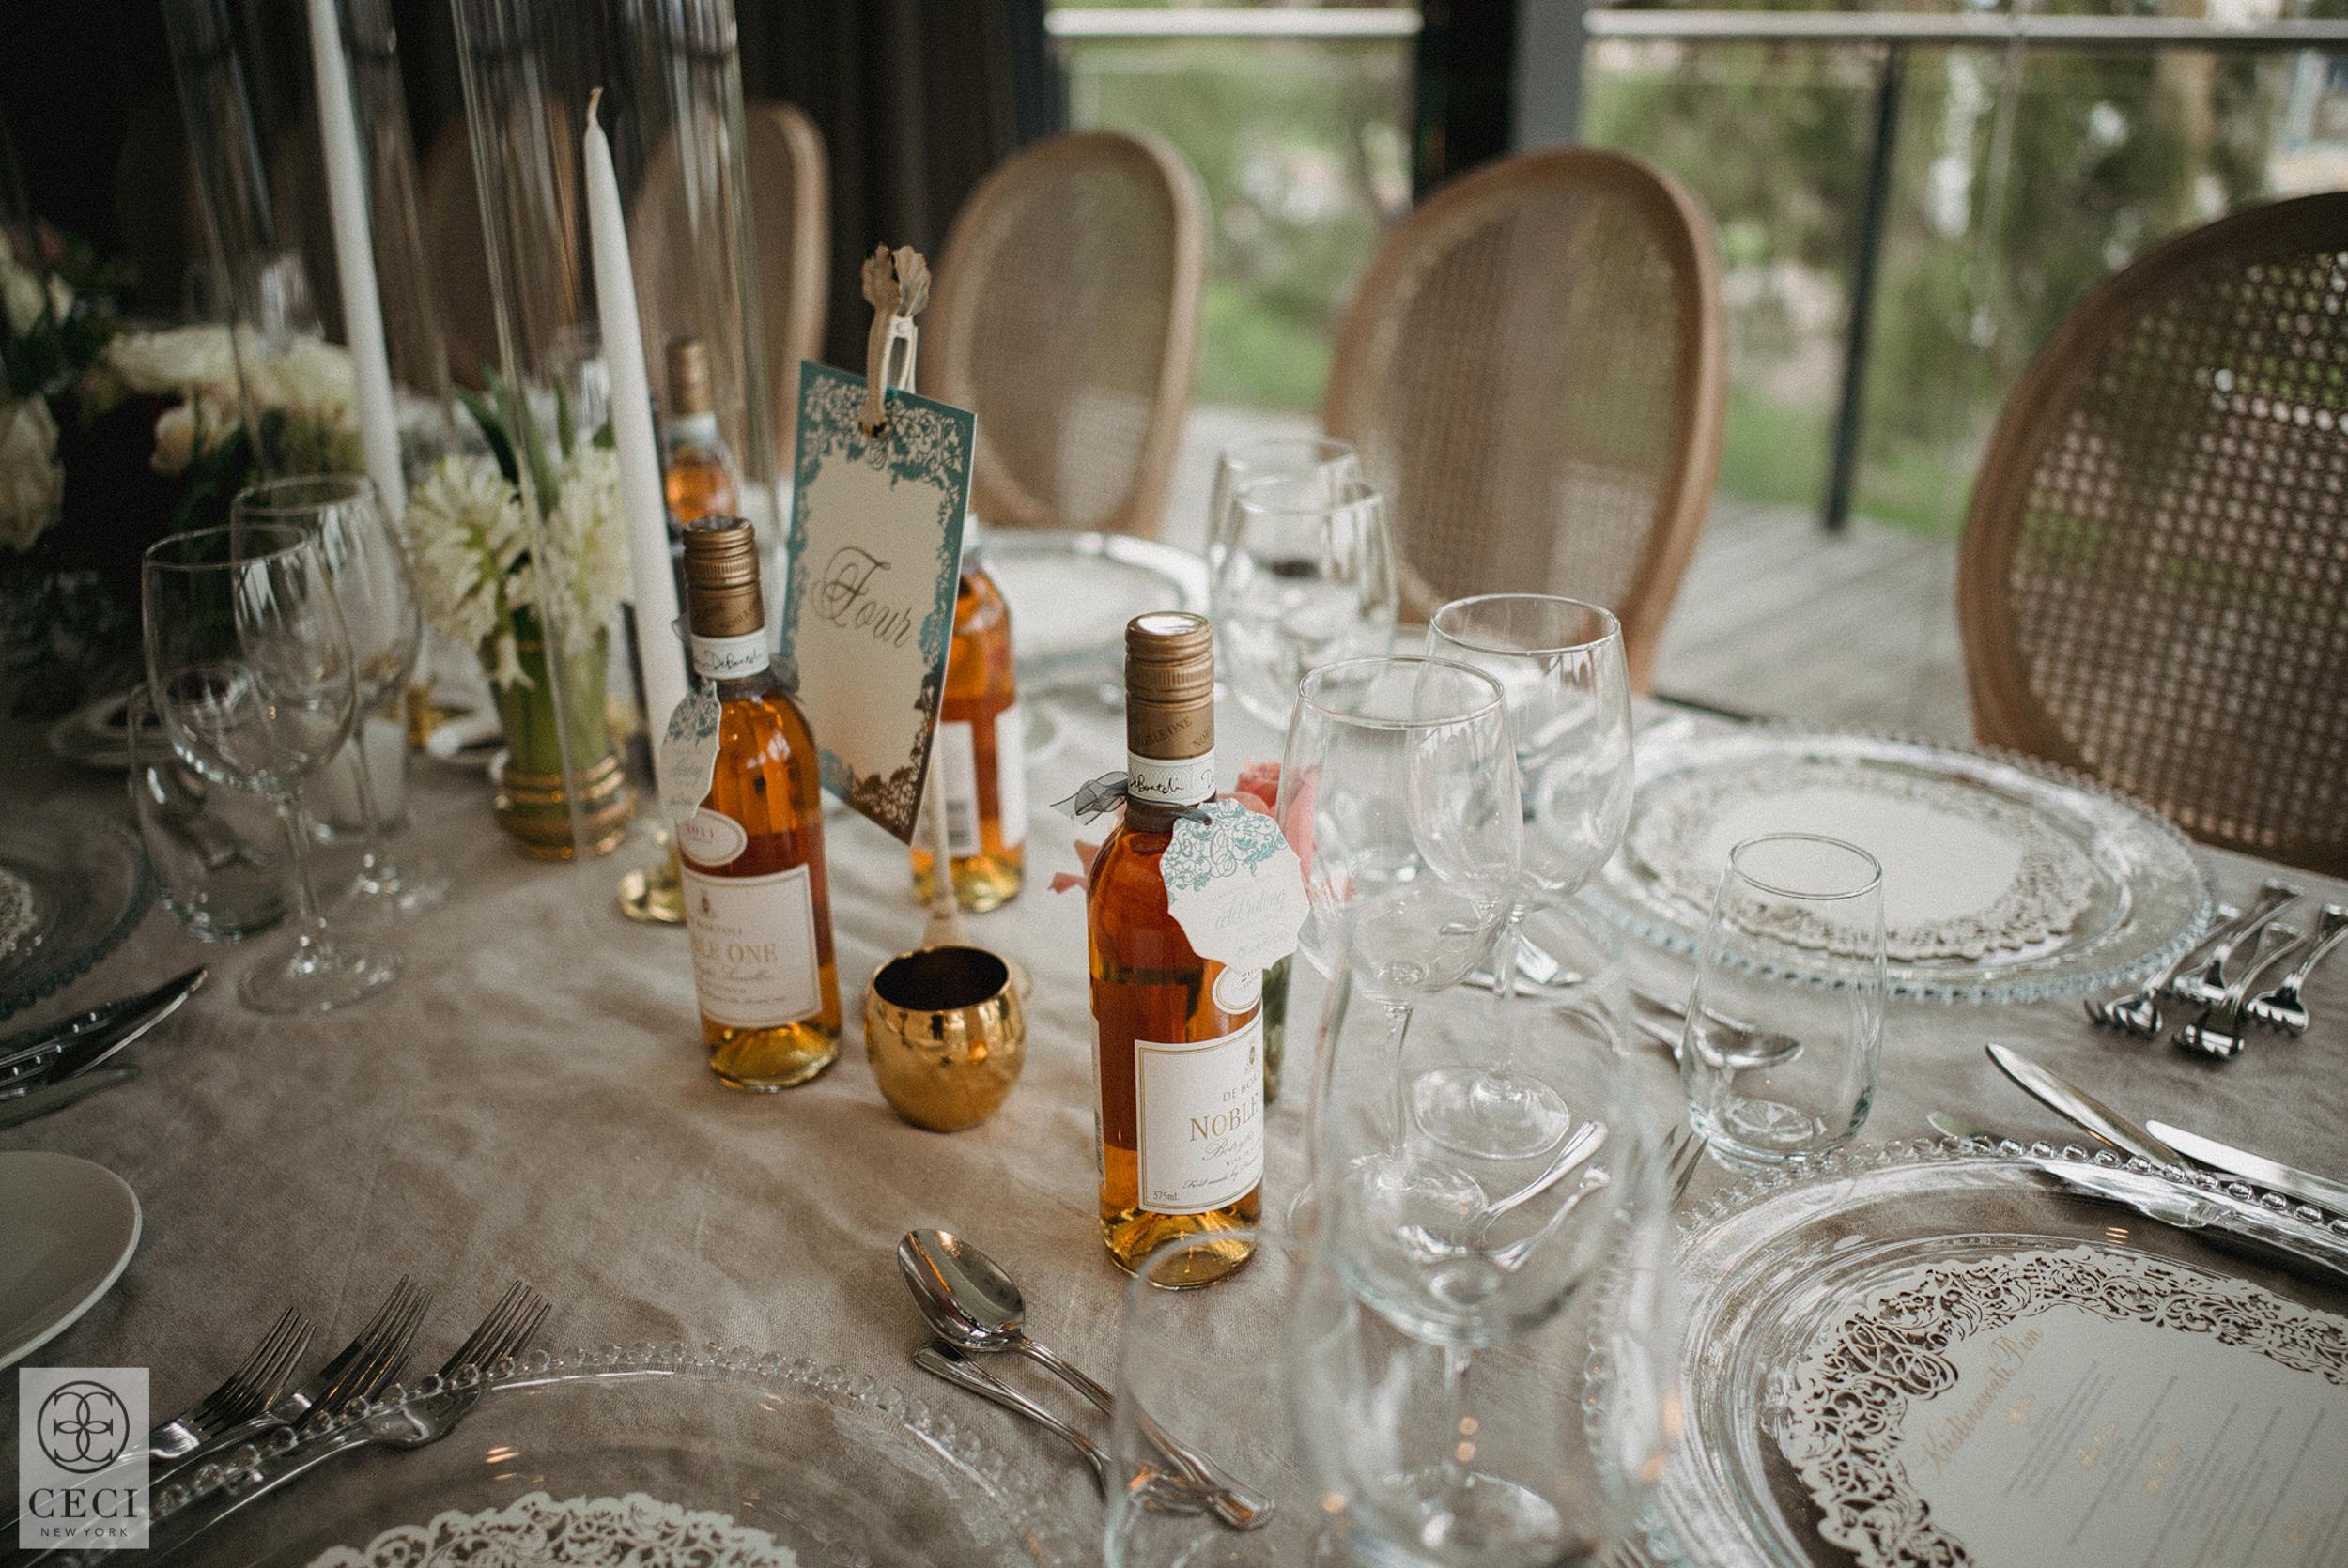 Ceci_New_York_Custom_Luxury_Wedding_BeautyShot_LaserCut_Stationery_Personalized_Couture_Foil_Stamping_Perth_Destination_Australia_Chic_-11.jpg